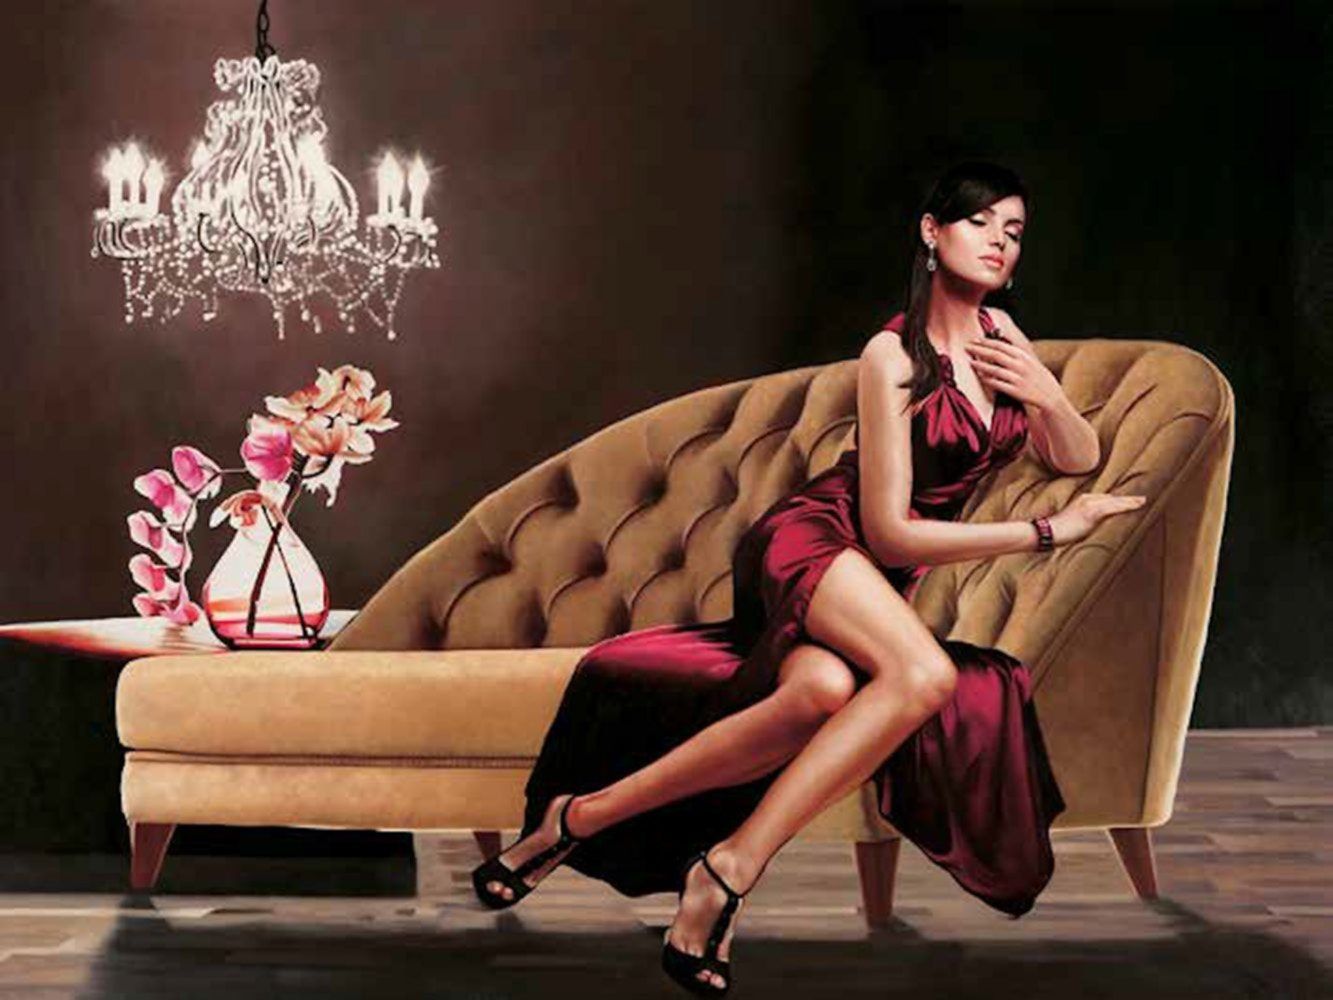 Home Affaire Bild Kunstdruck »Pierre Benson, Jewel«, 80/60 cm